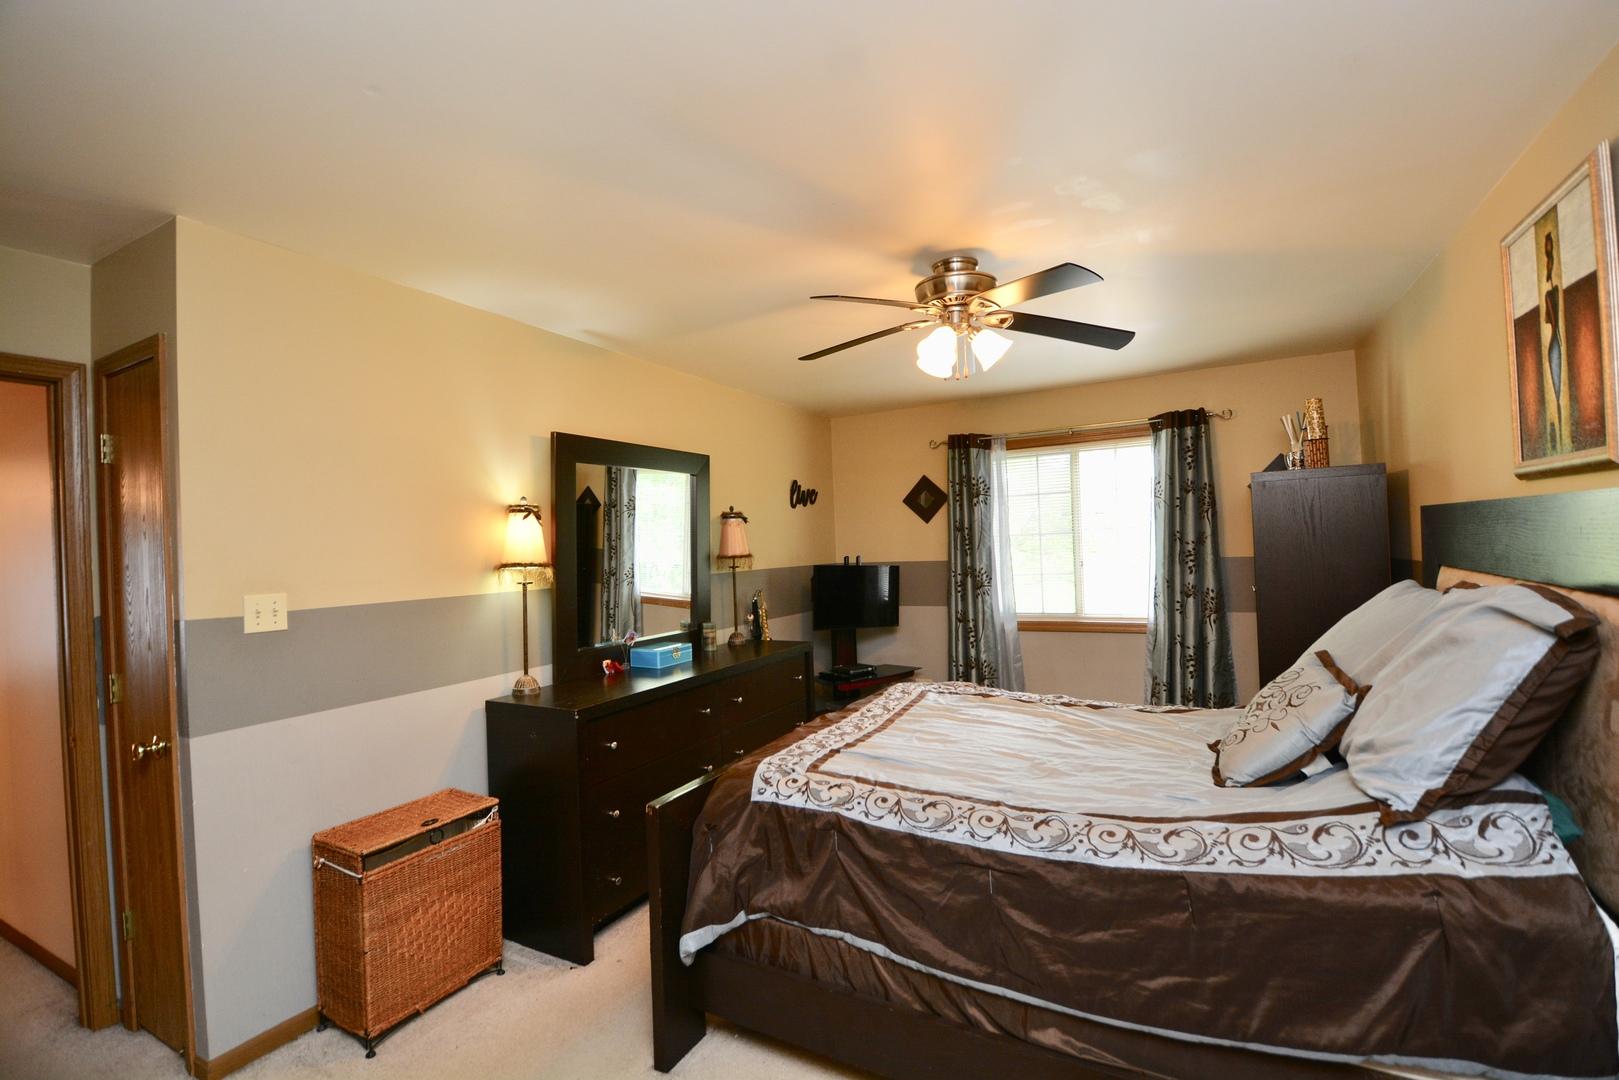 3480 Willowview, AURORA, Illinois, 60504